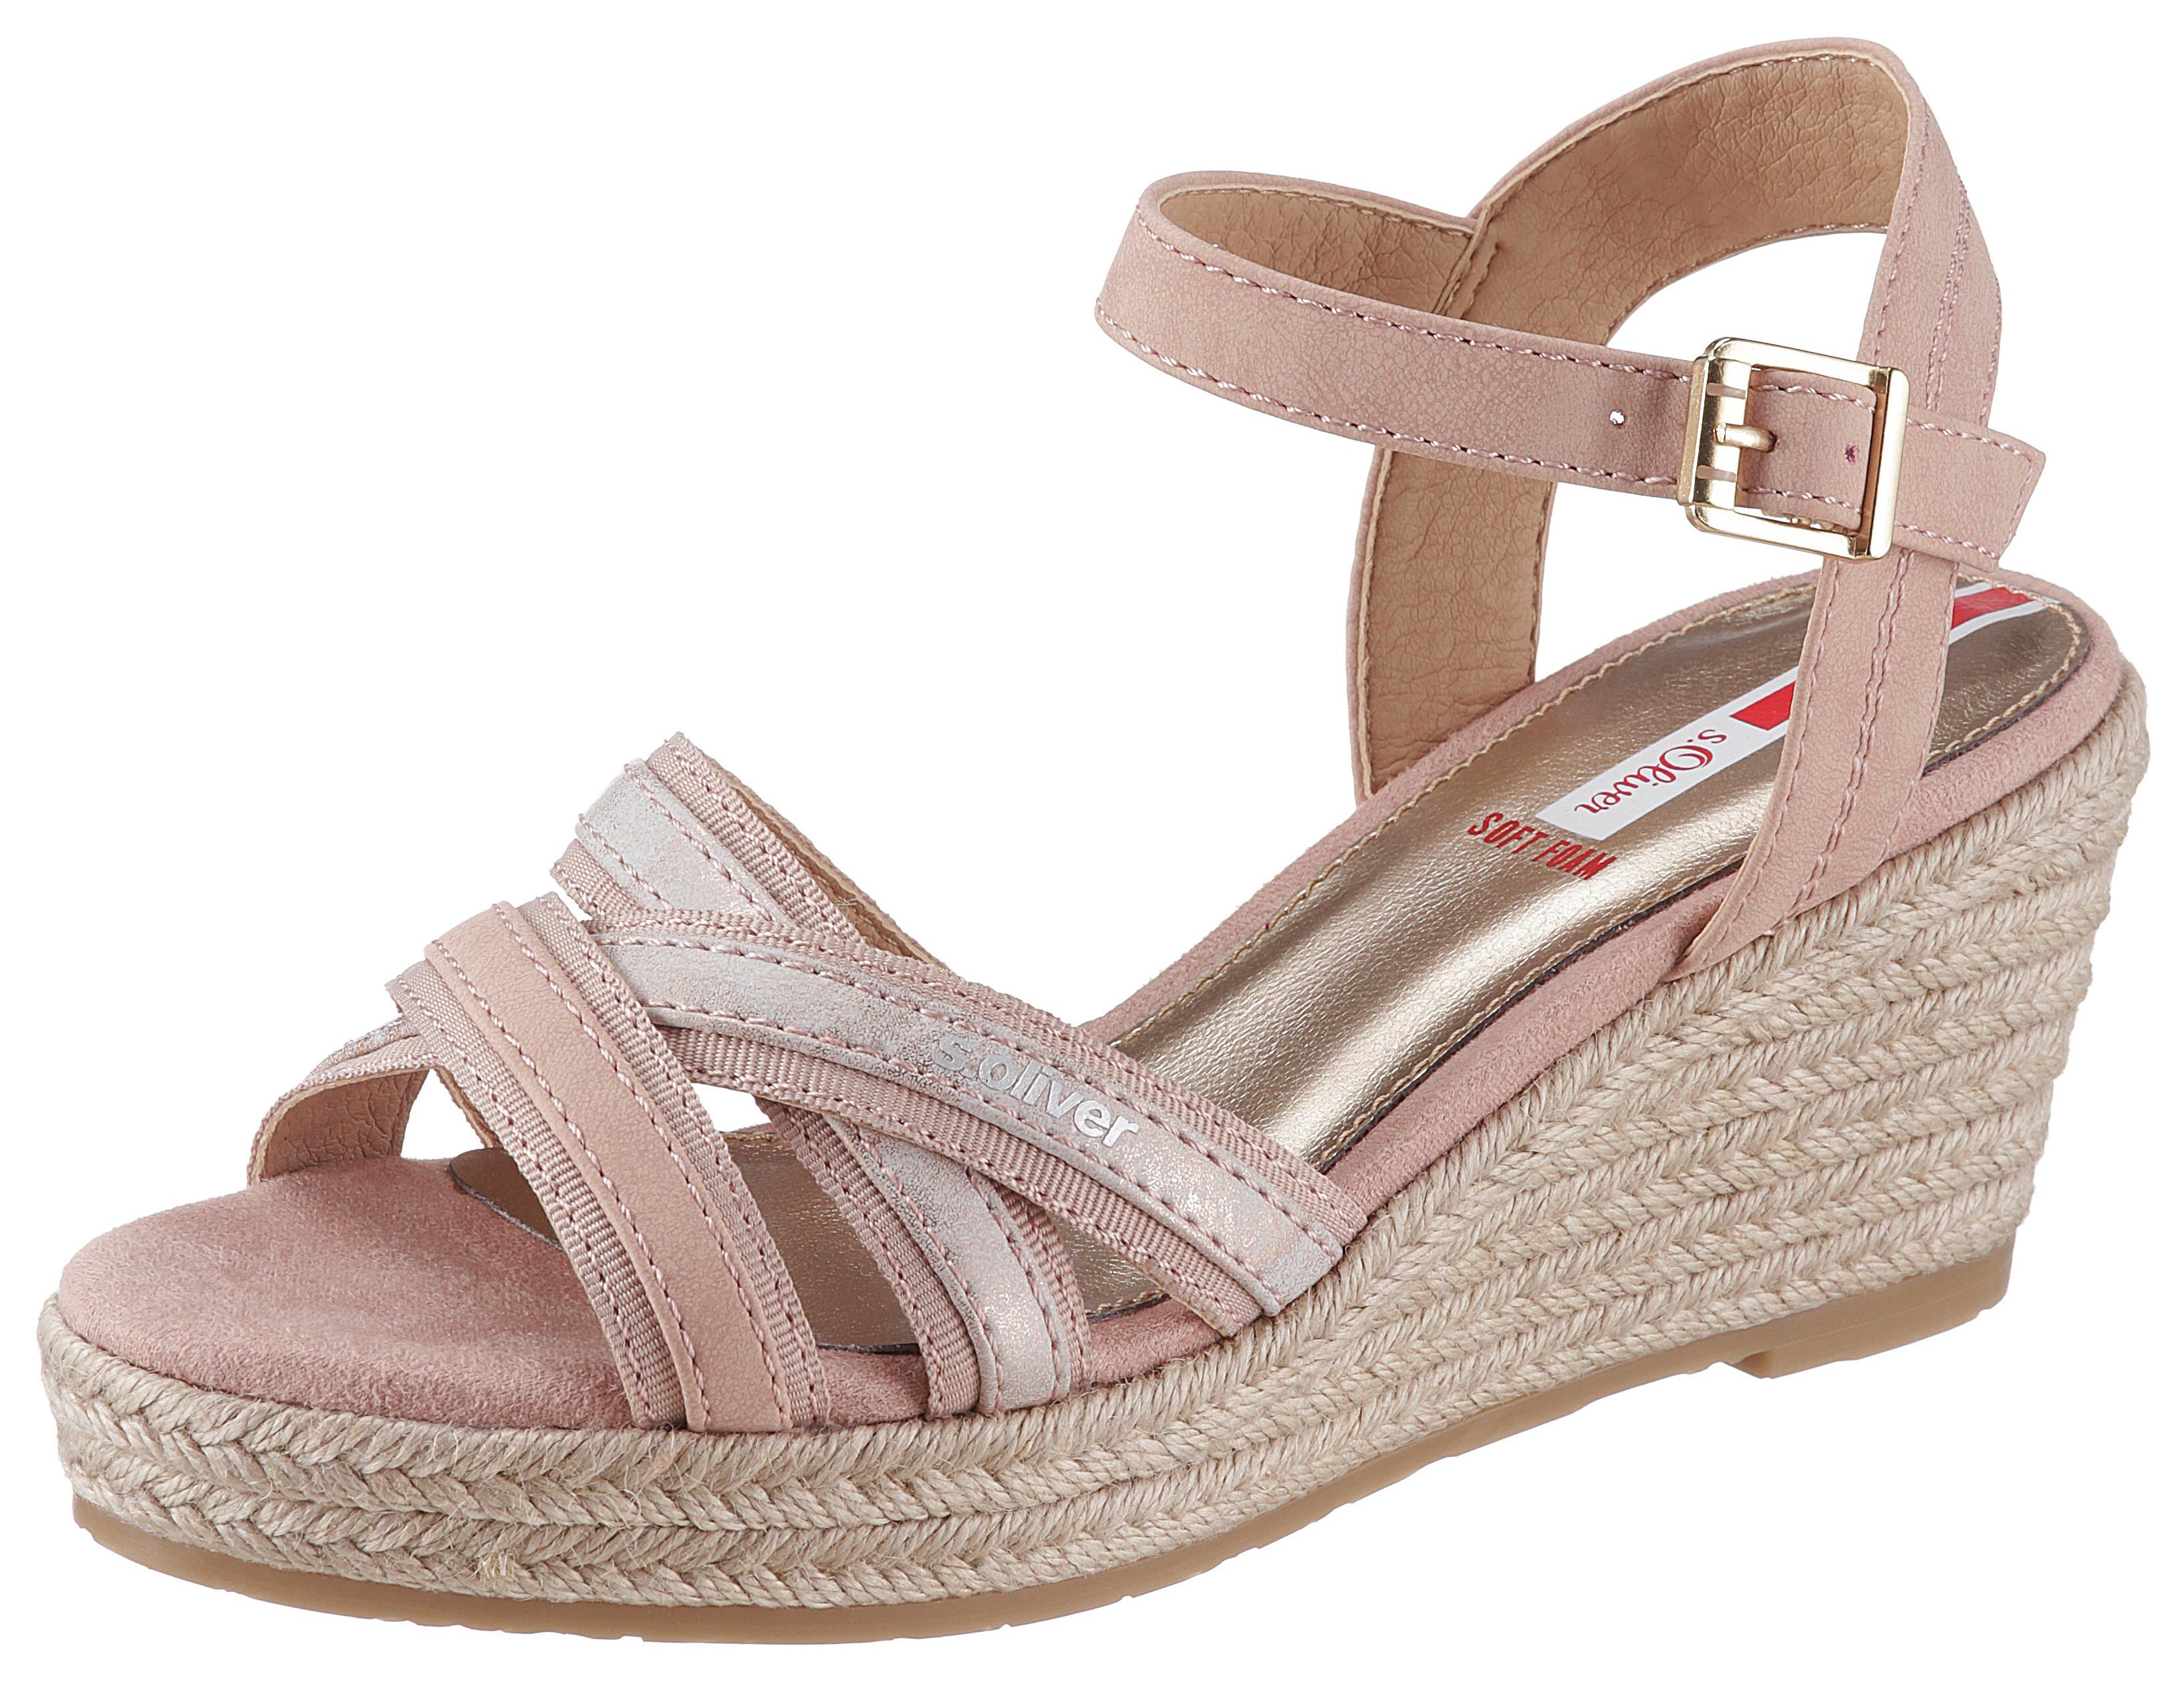 s.Oliver Sandalette, mit Jute-Besatz rosa Damen Sandaletten Sandalen Sandalette